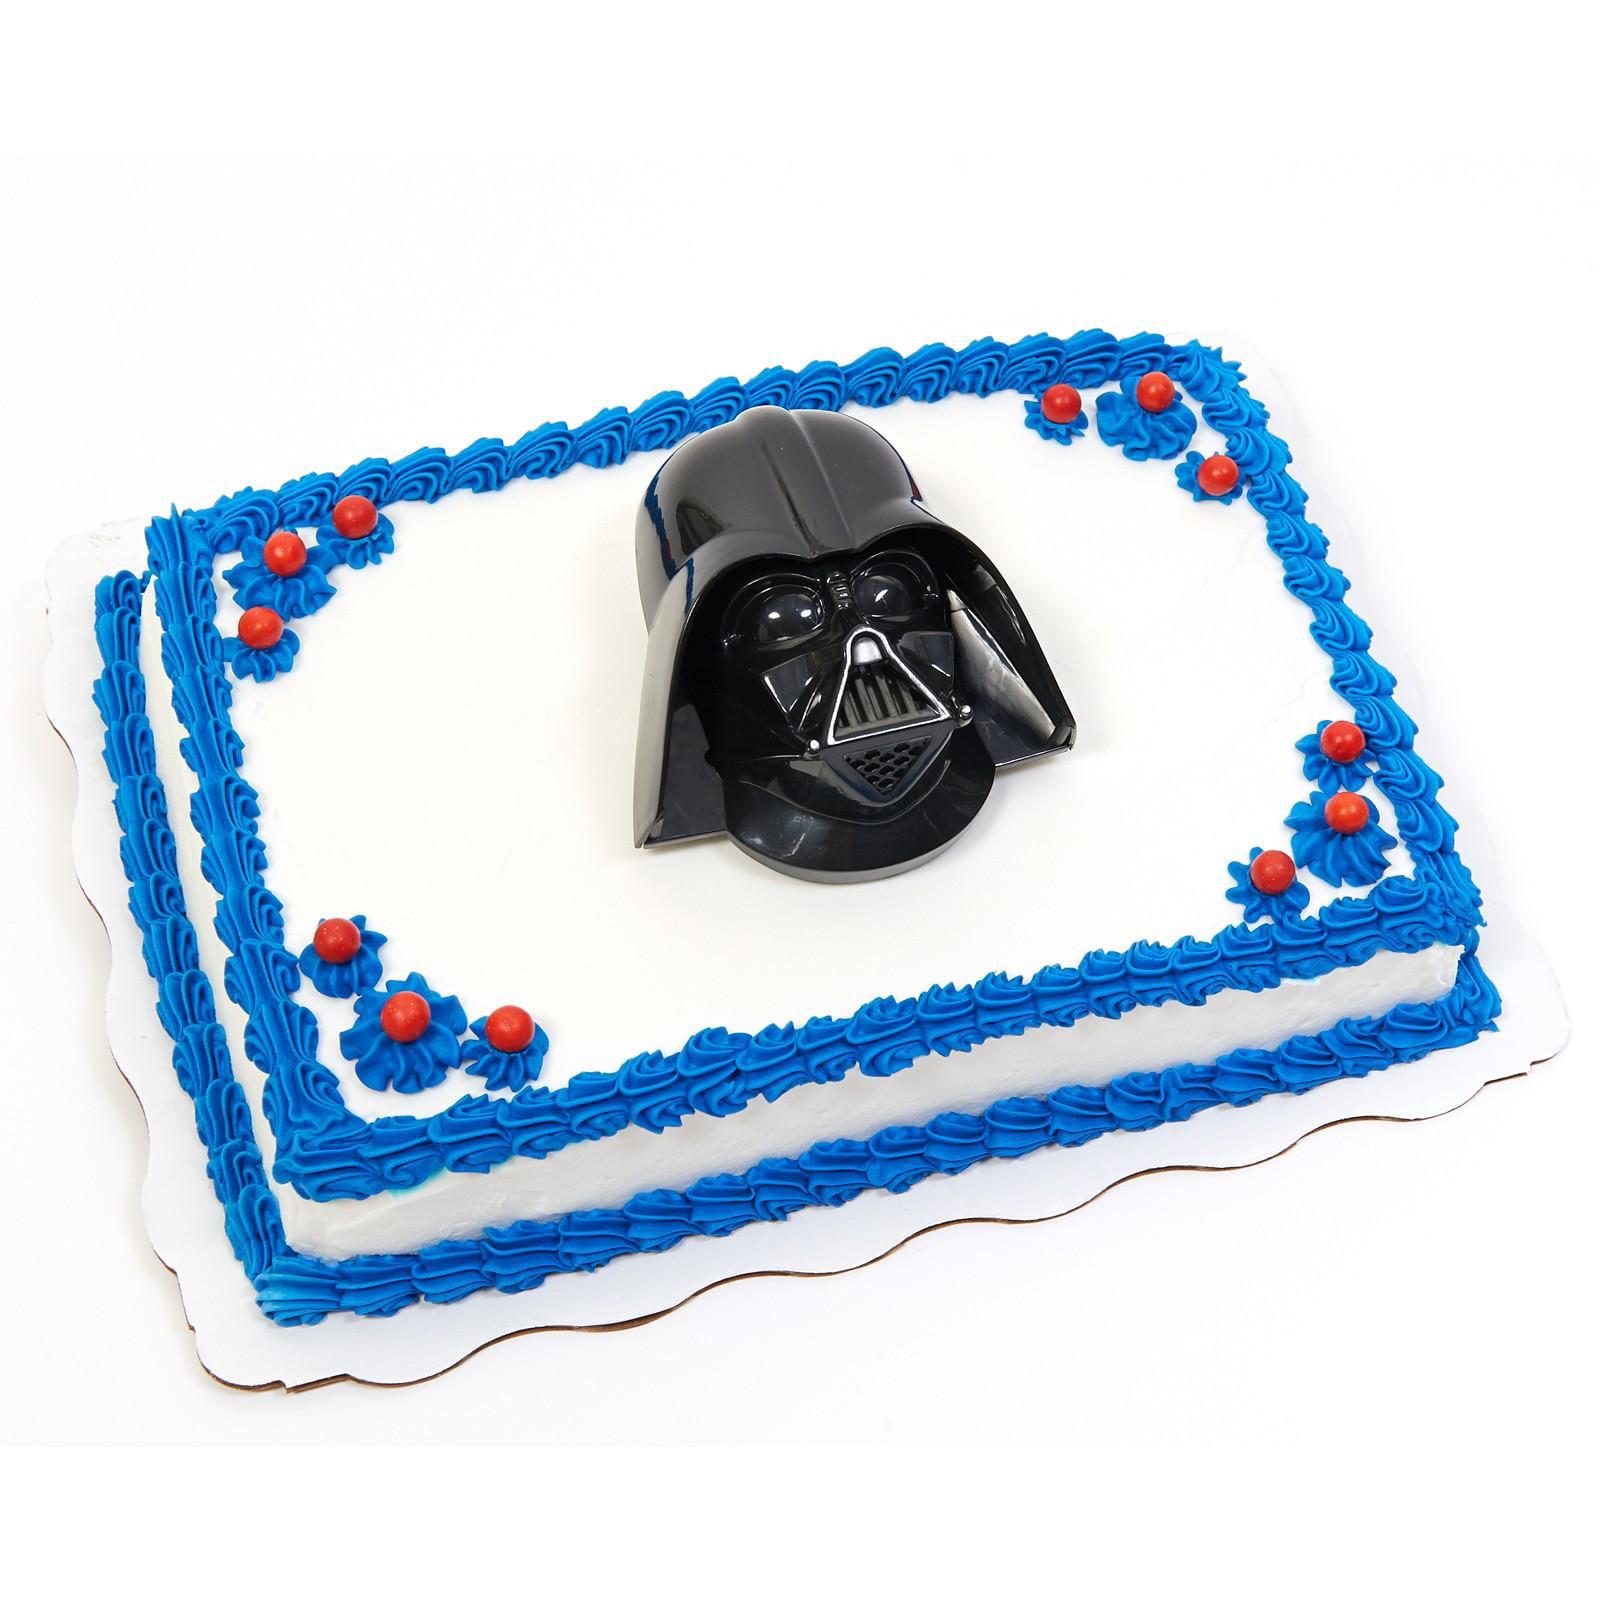 Star Wars Darth Vader Cake Topper Walmartcom